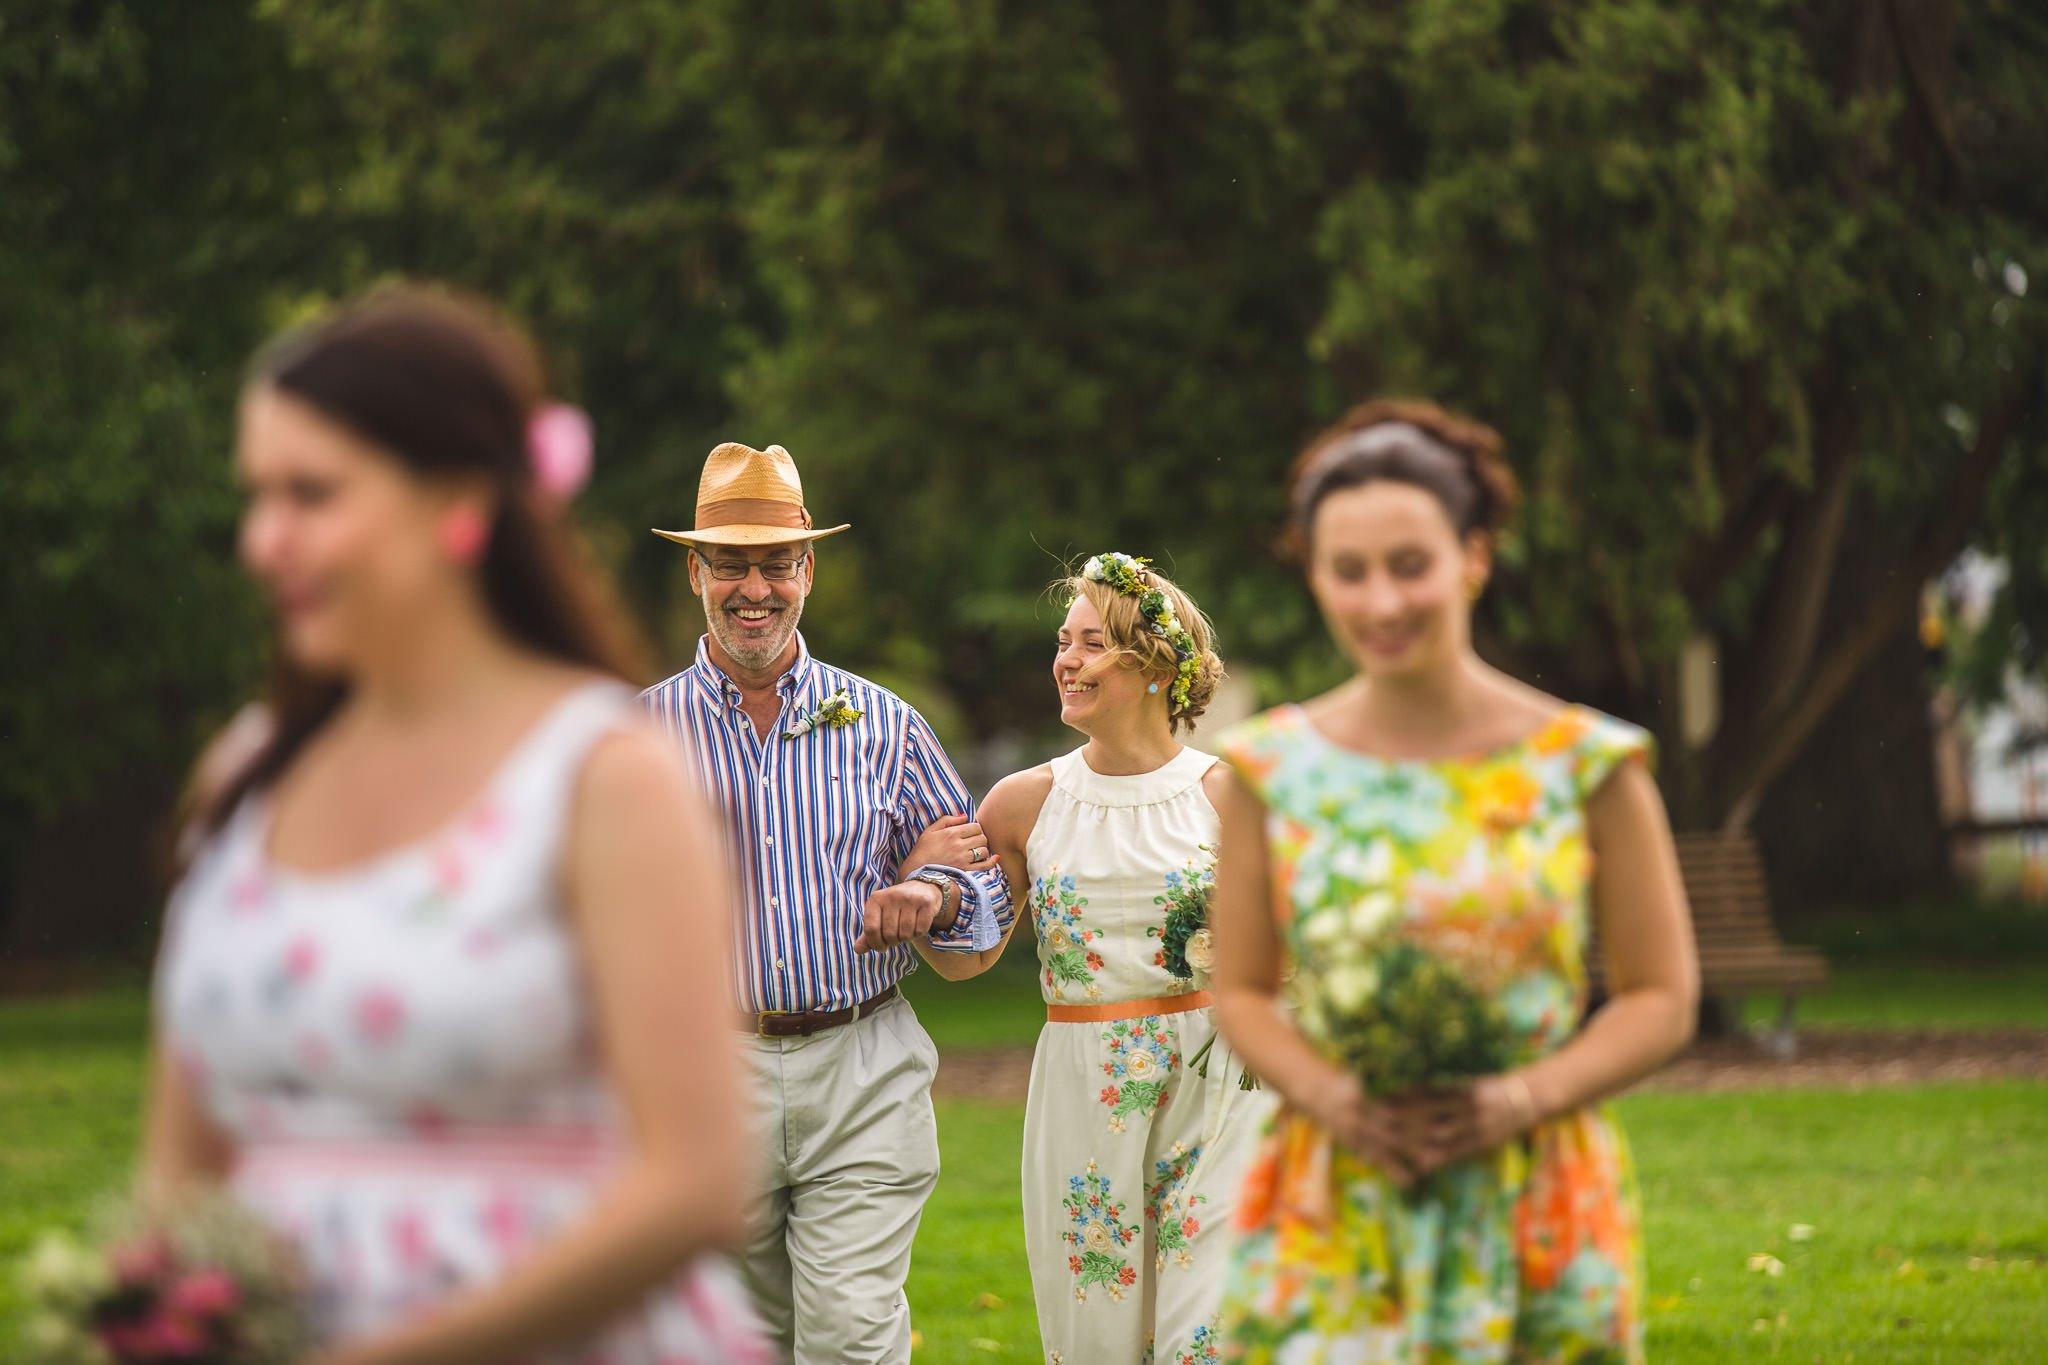 Documentary style wedding photography - Jon Harris Photography